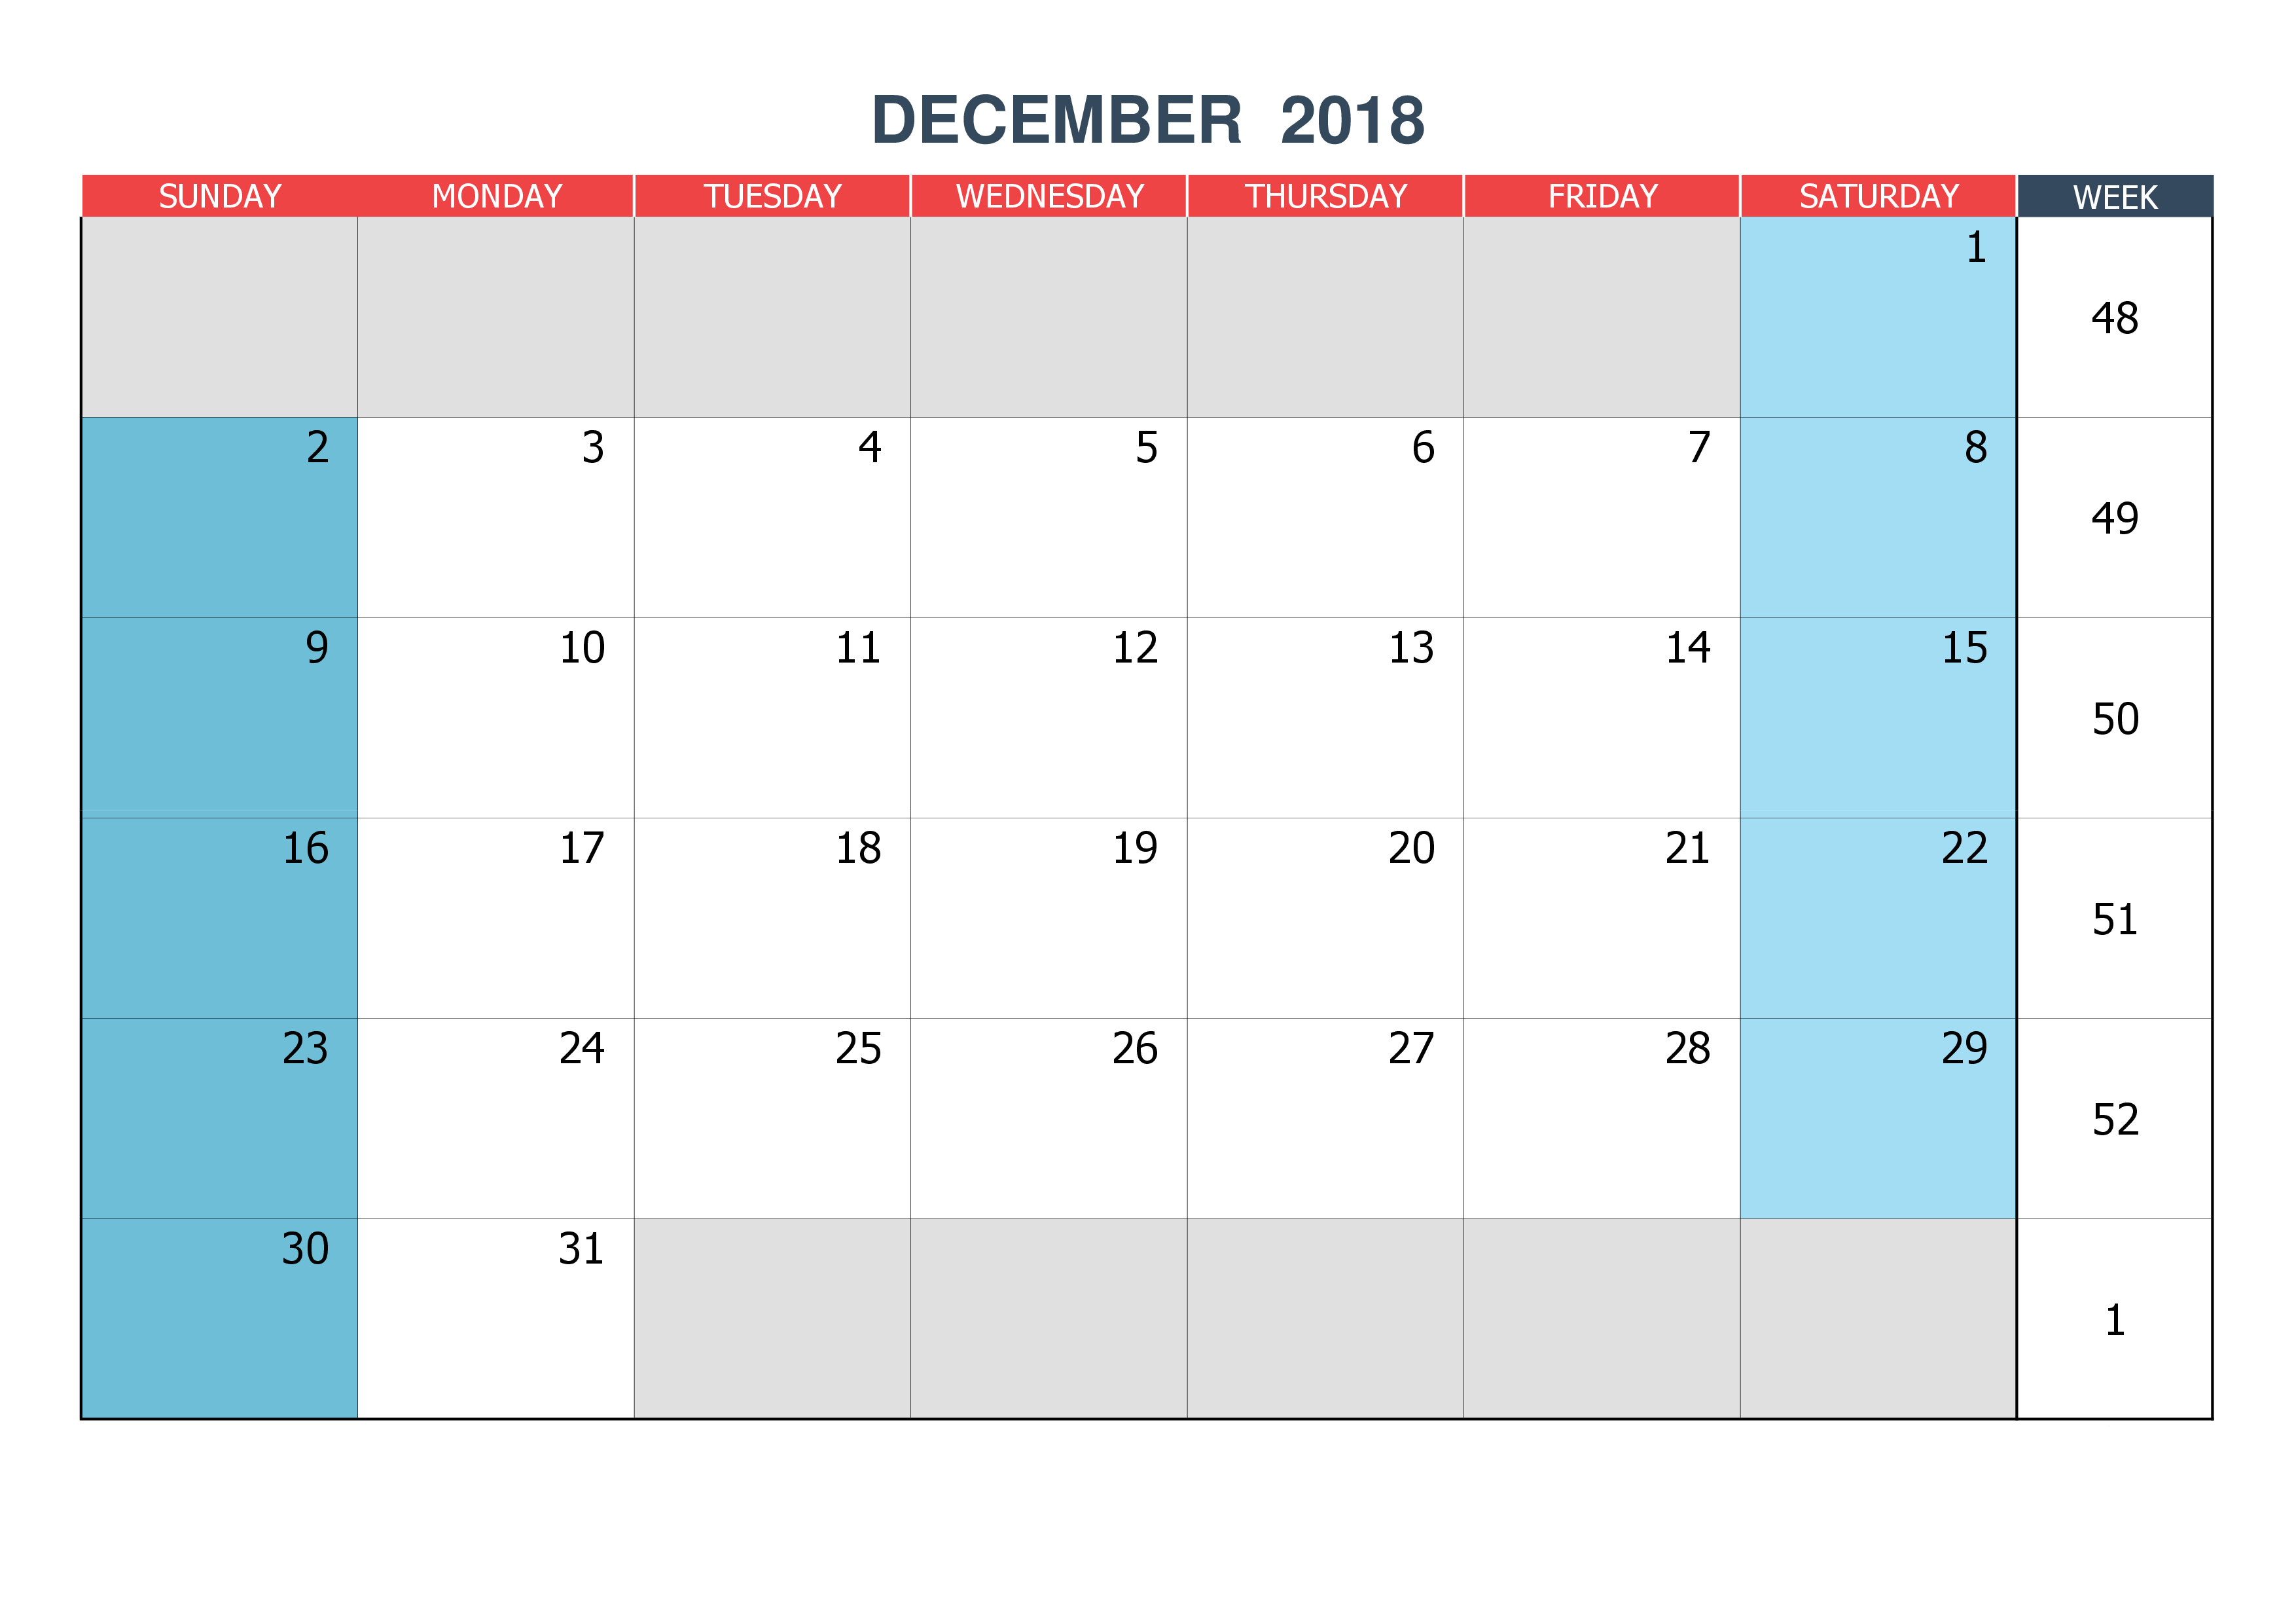 December 2018 Calendar Design Template